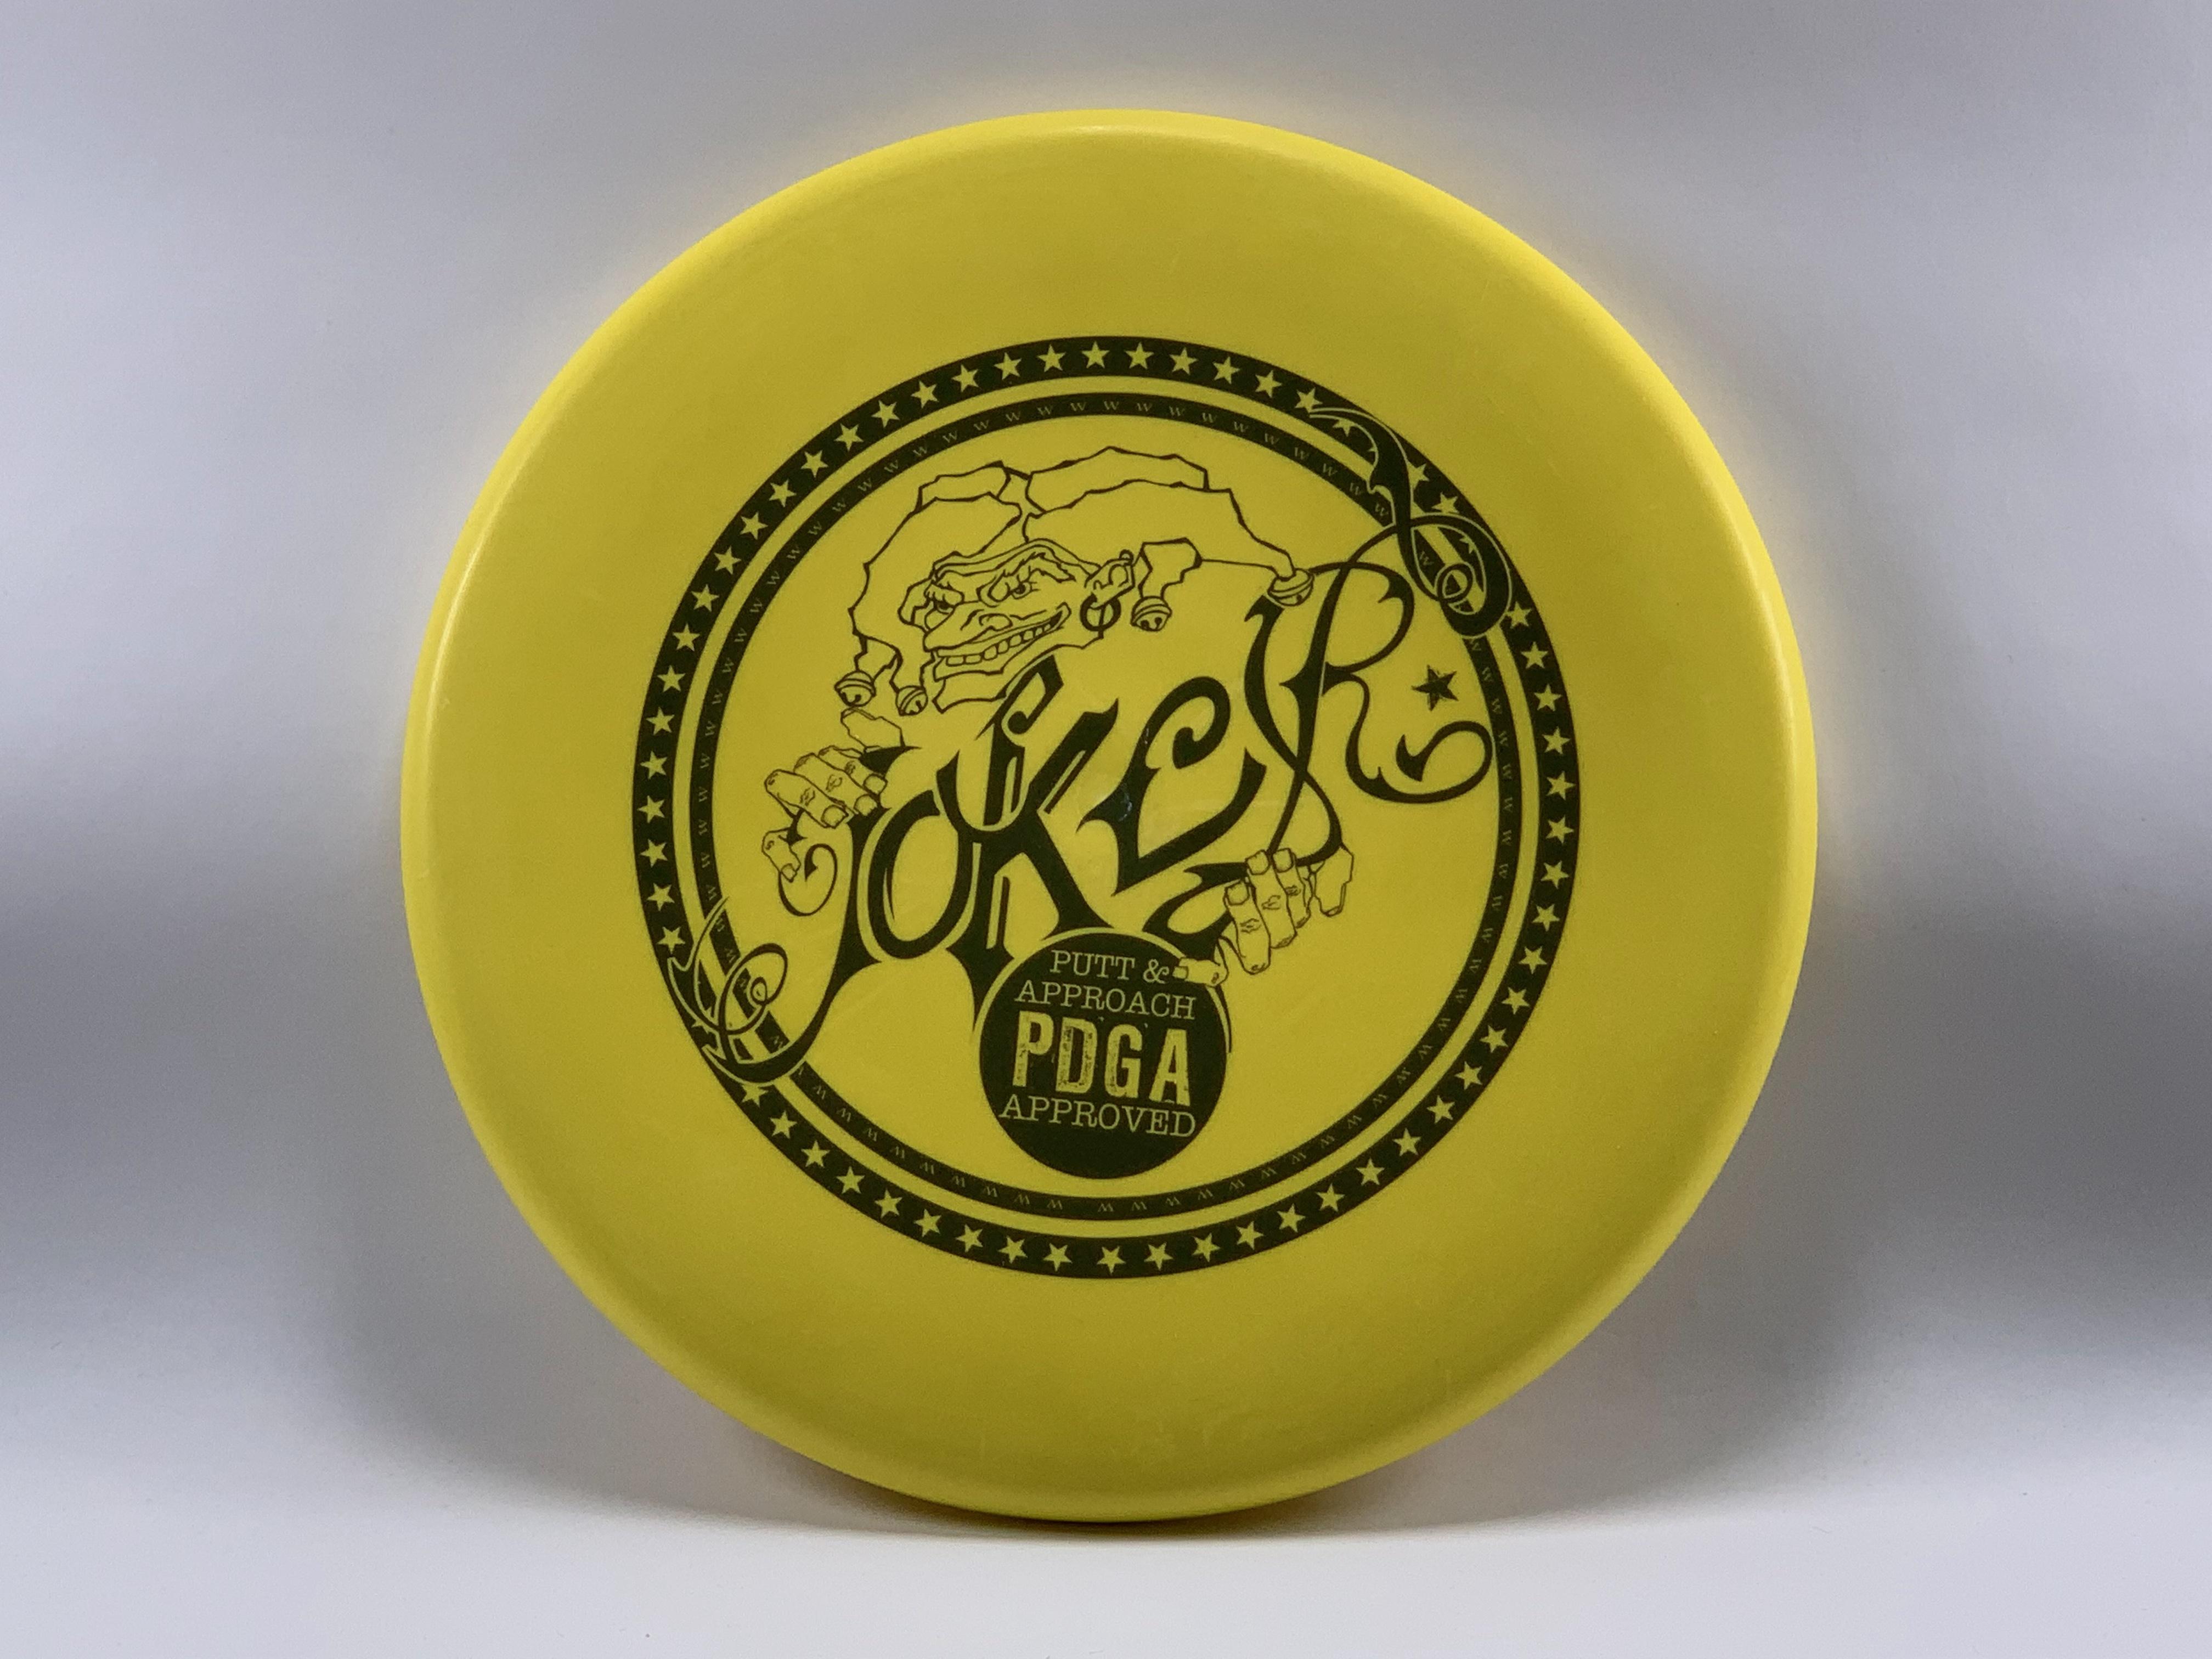 Prodiscus Basic (soft) Jokeri